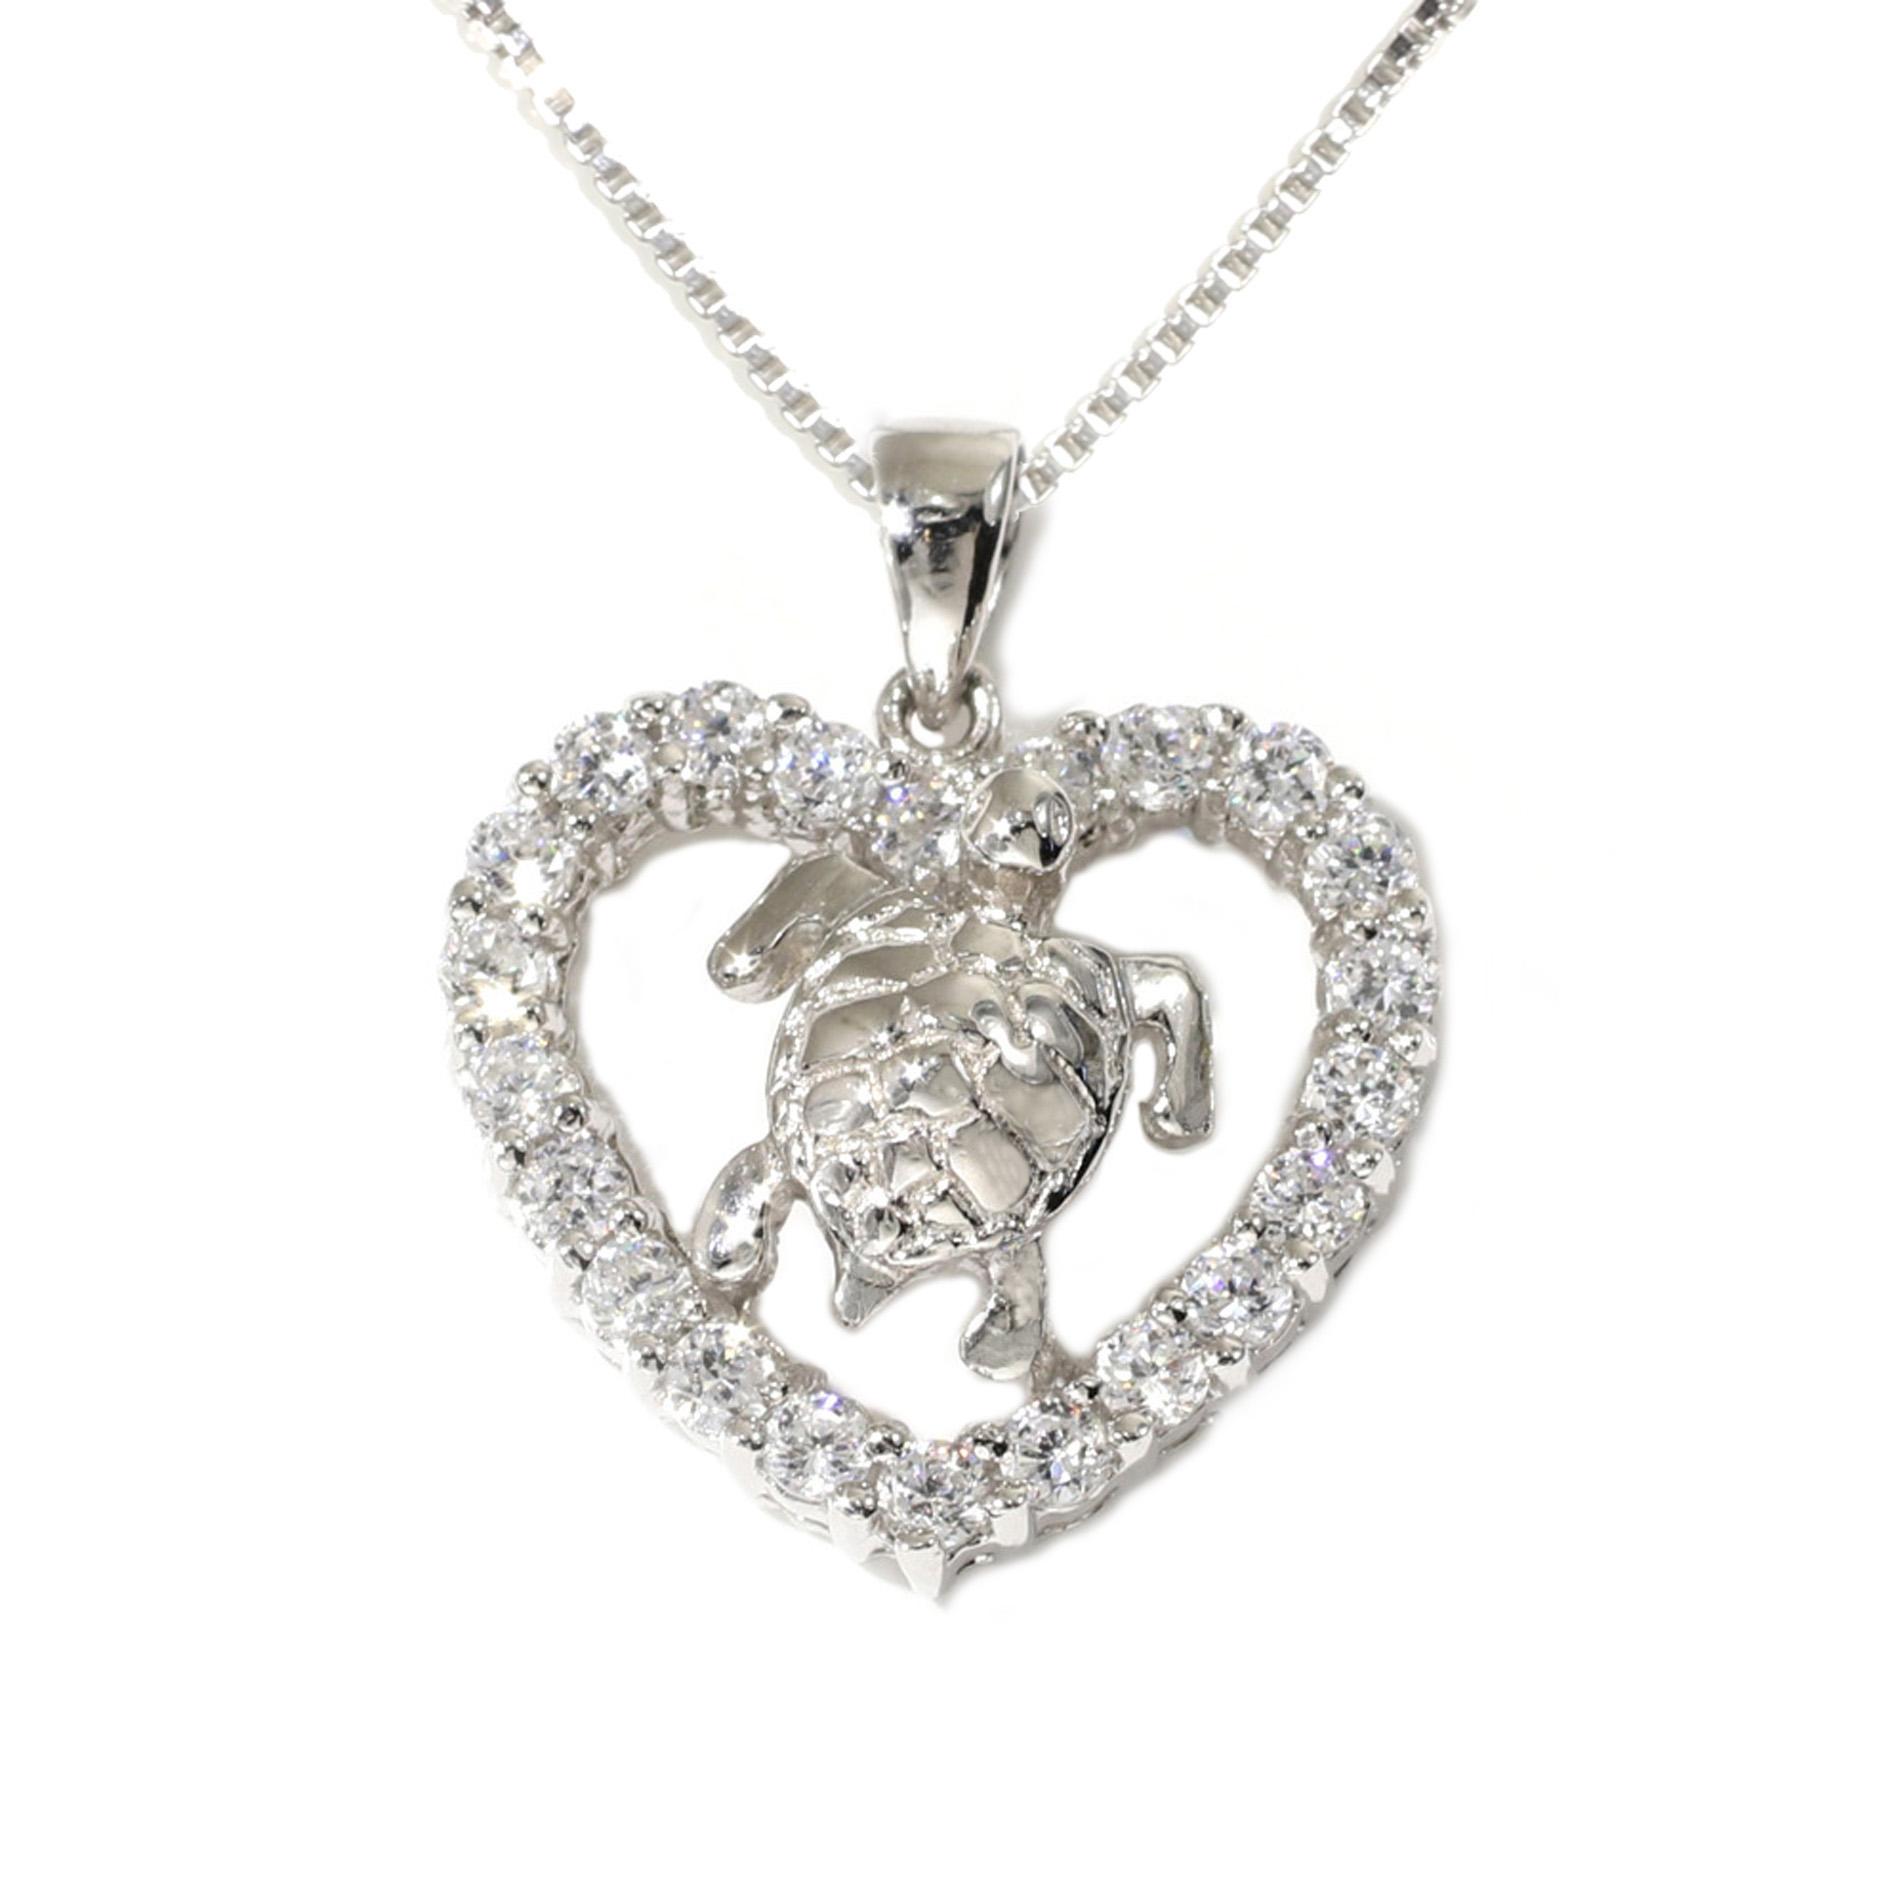 Tamara g designs sea turtle in a heart halo pendant sea turtle in a heart halo pendant aloadofball Choice Image